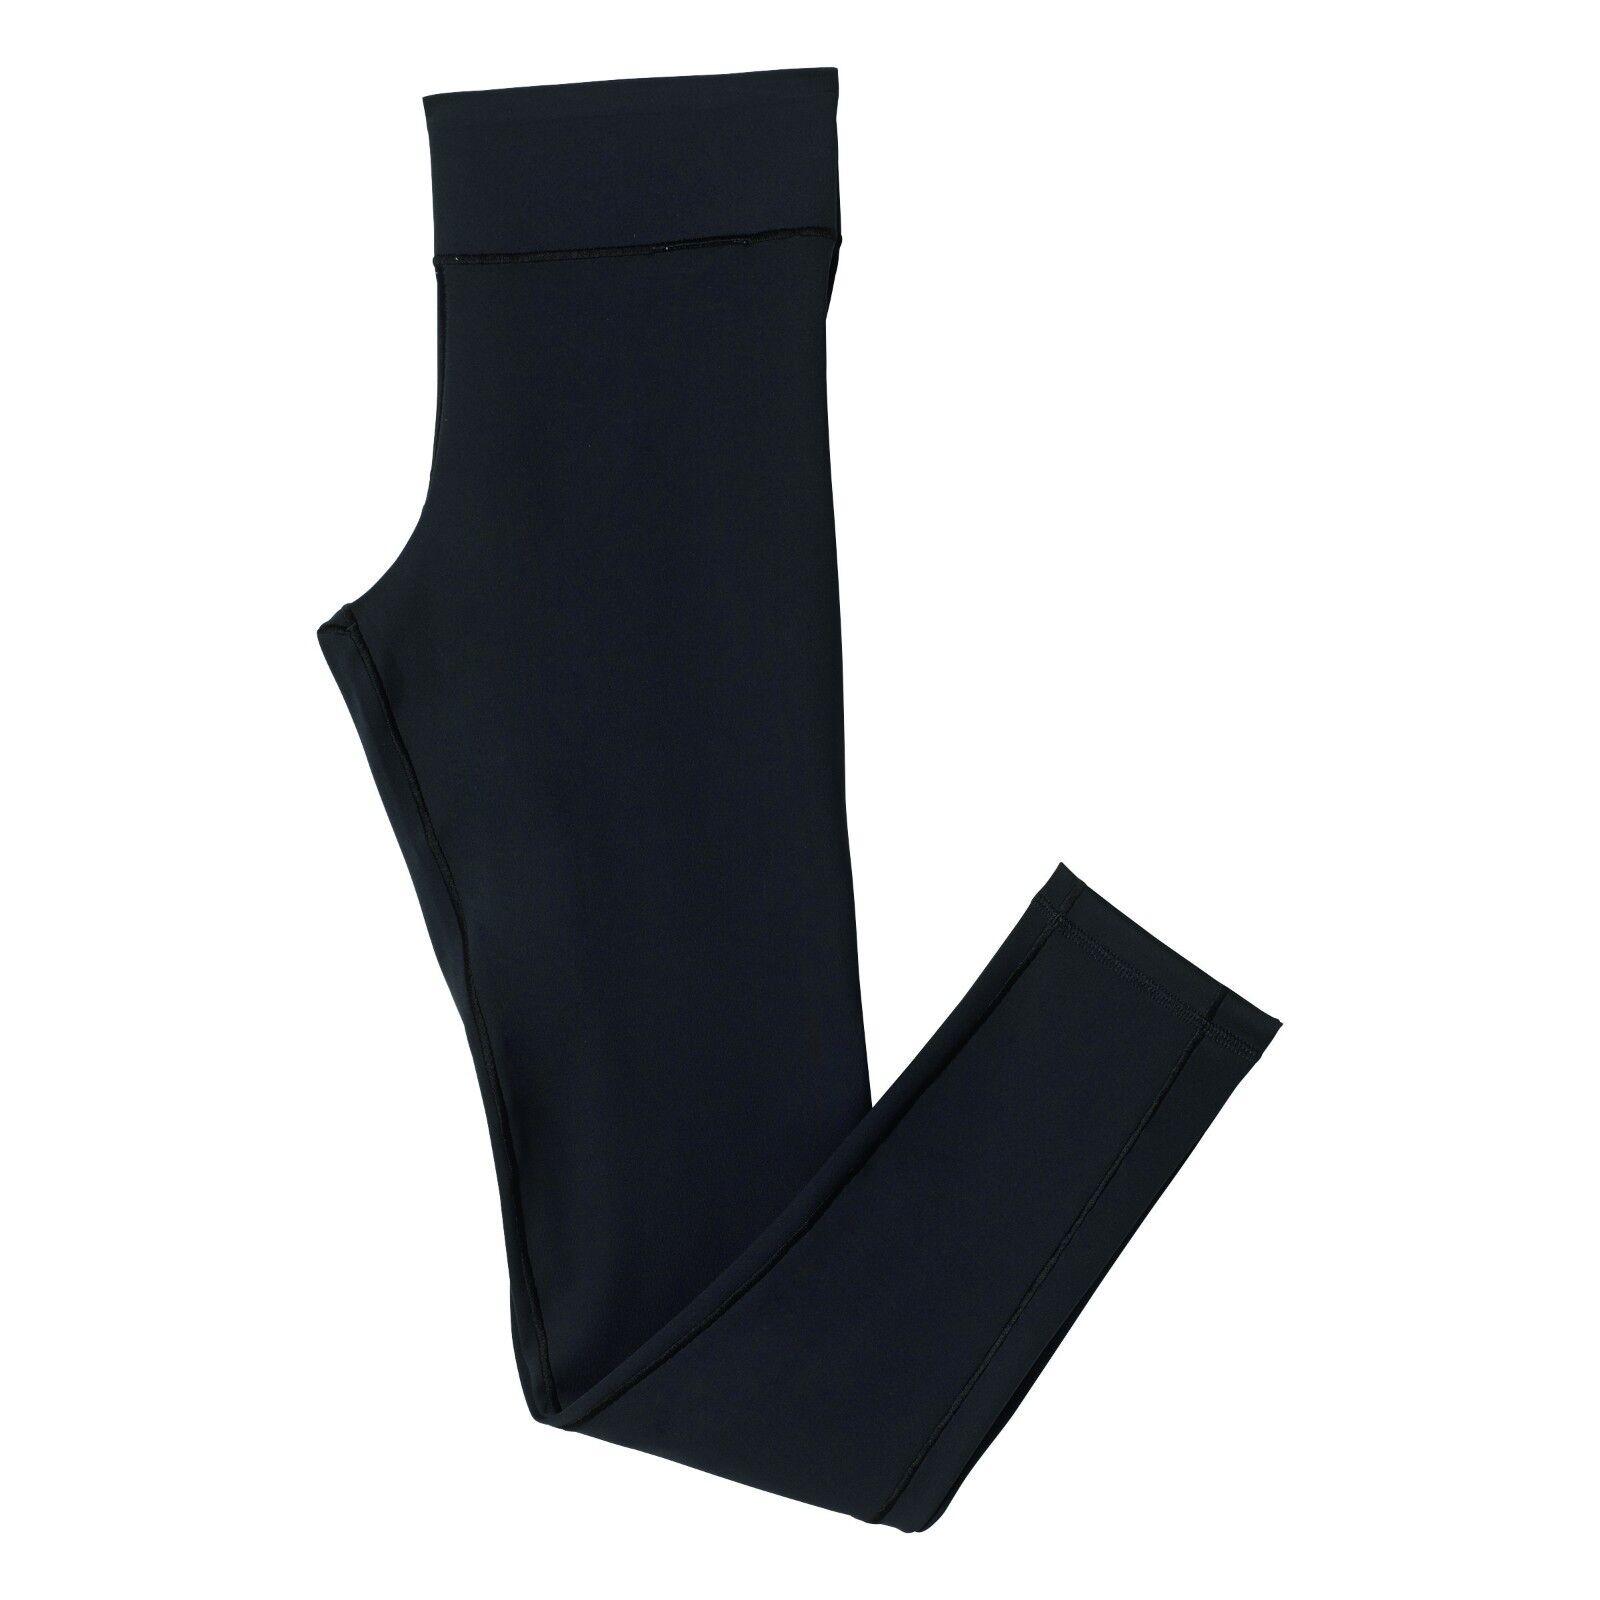 Adidas Ultimate Fit Long Tight - lange DaSie Tight - NEU - AI7286